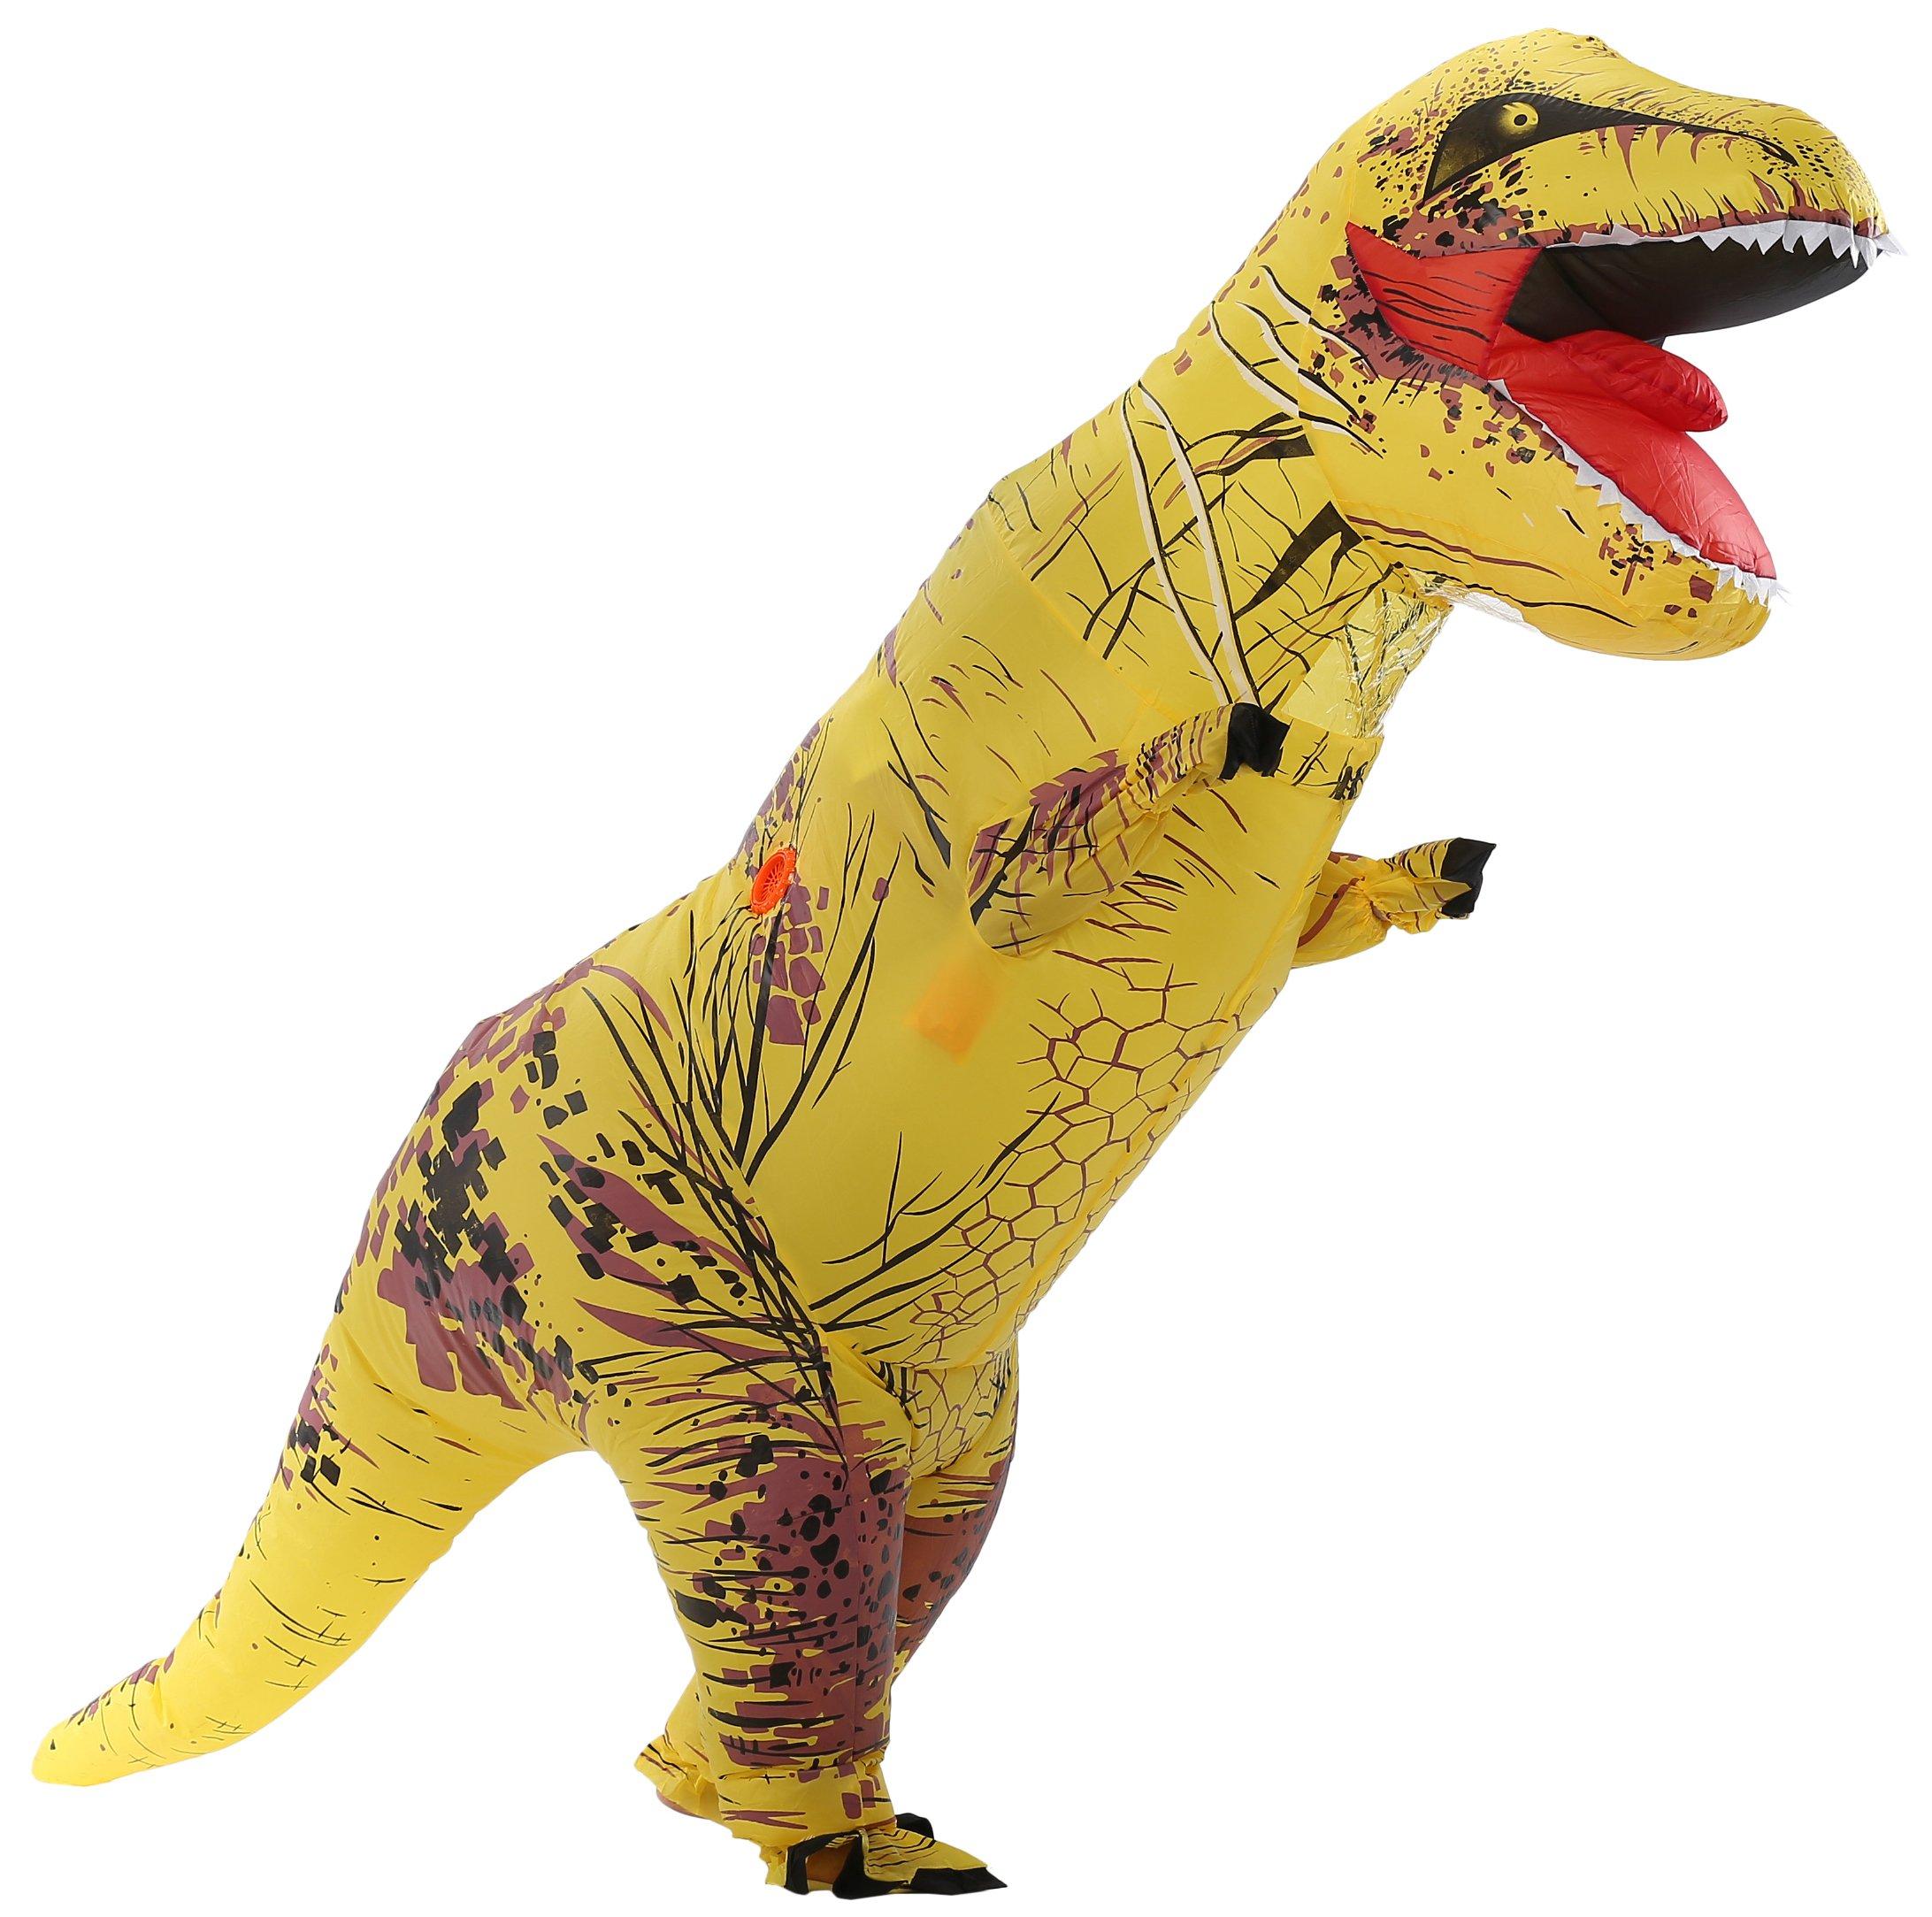 caringgarden Unisex Jurassic T-Rex Inflatable Costume Dinosaur Fancy Dress Yellow Adult Size